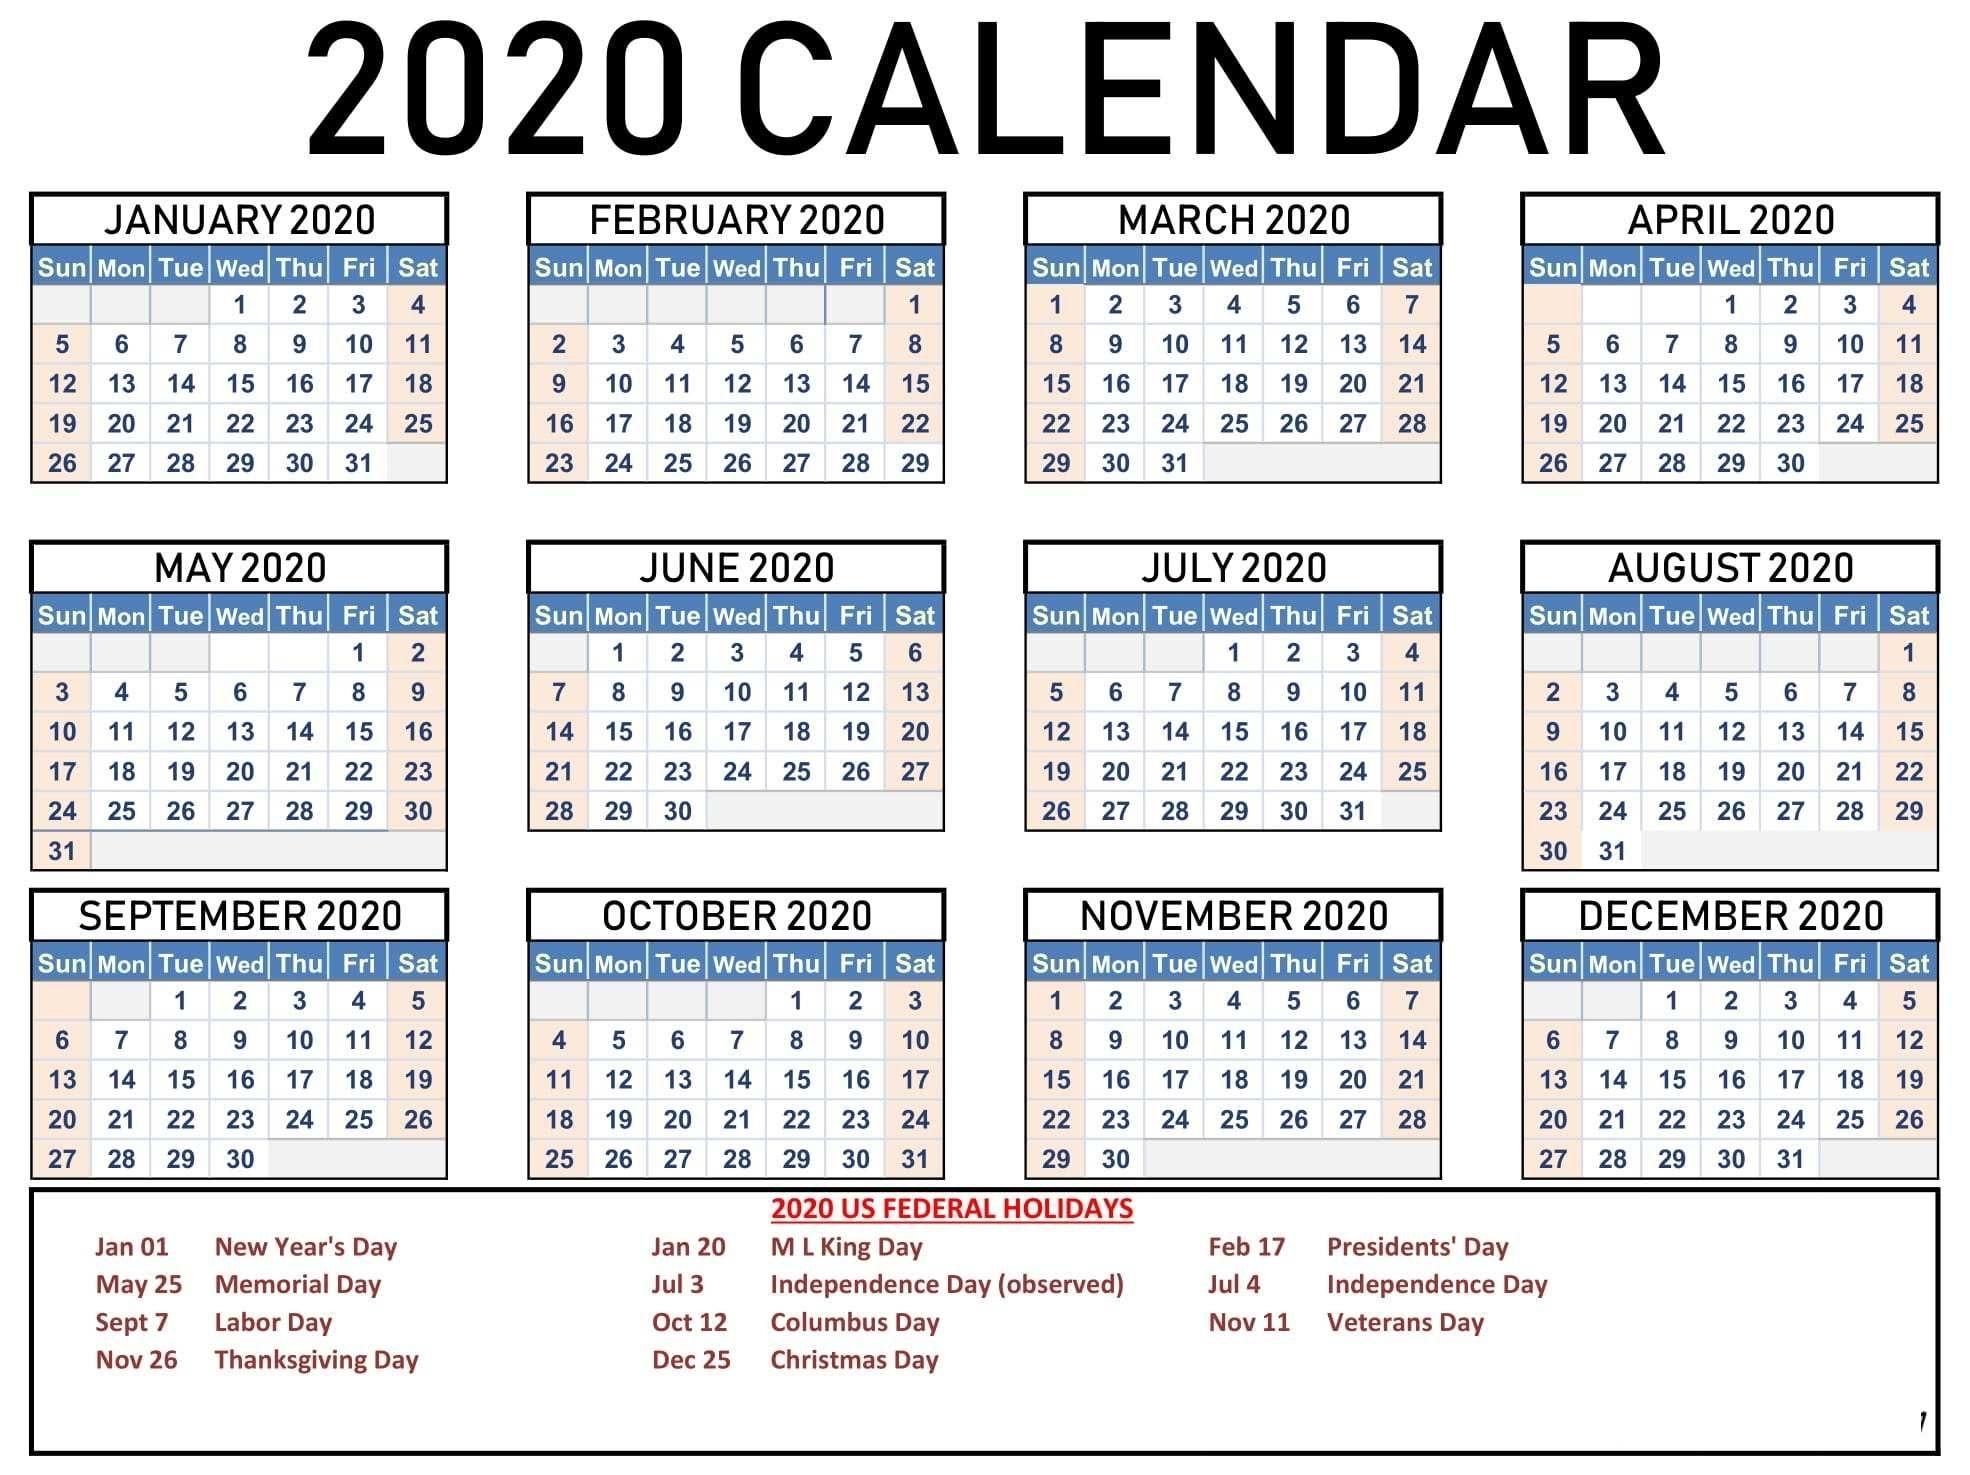 2020 One Page Calendar Printable Download In 2020 | Calendar